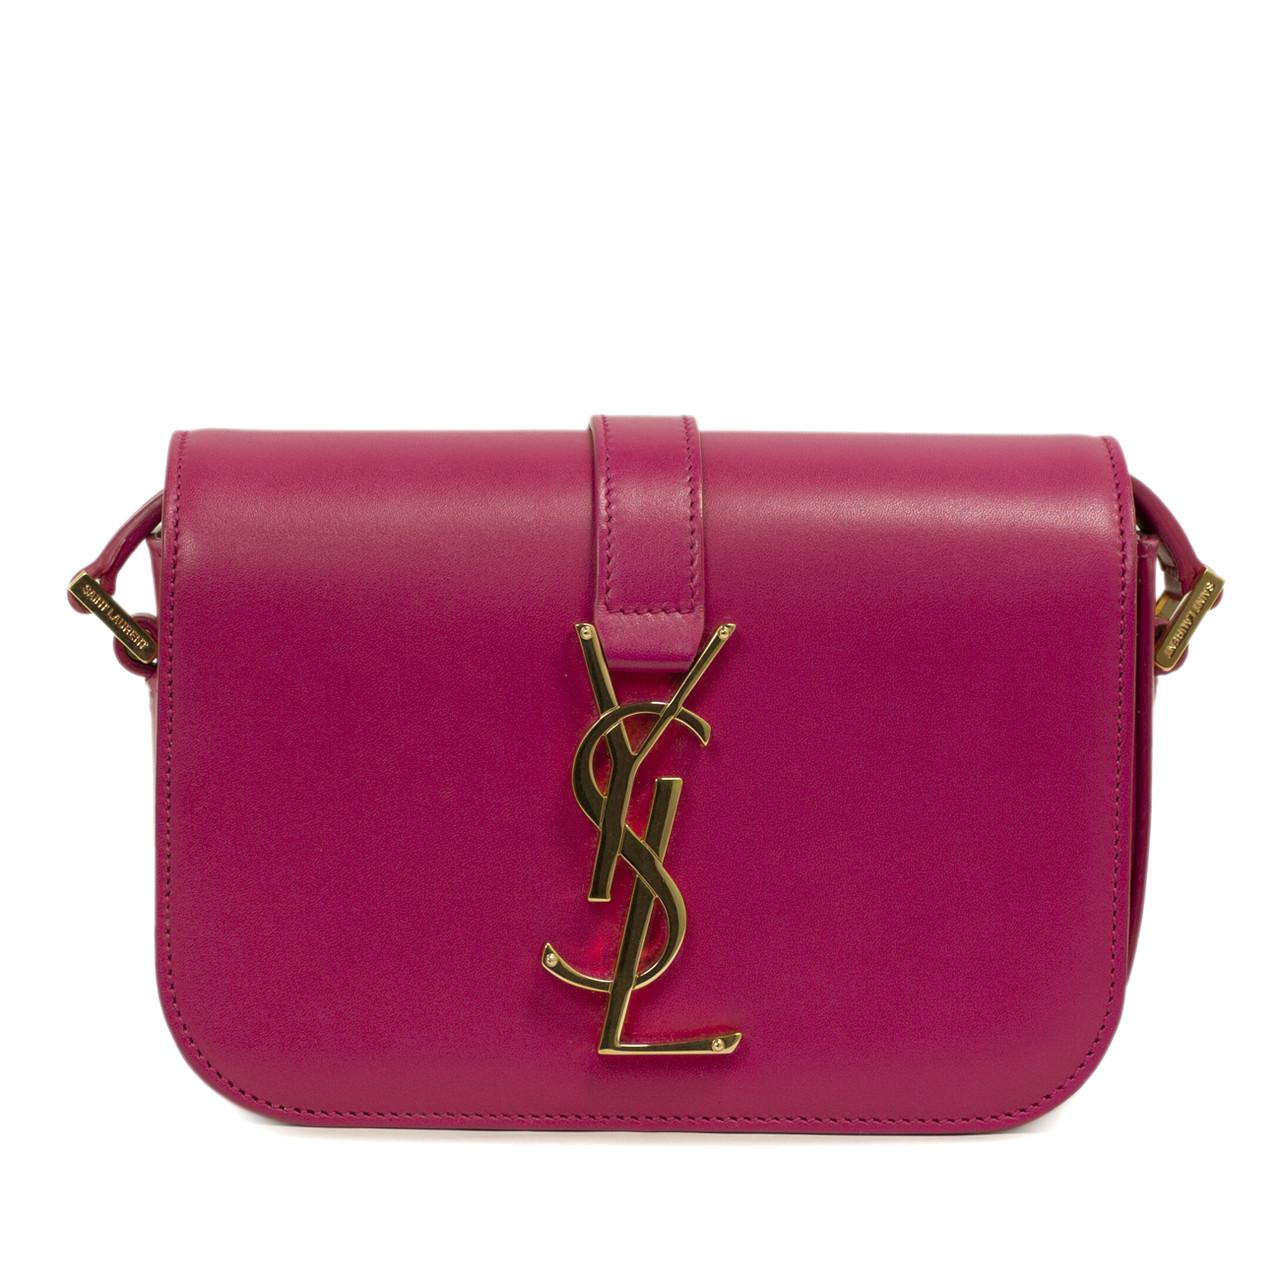 869478a2830e YSL Saint Laurent Pink Monogram Sac Universite Small Shoulder Bag